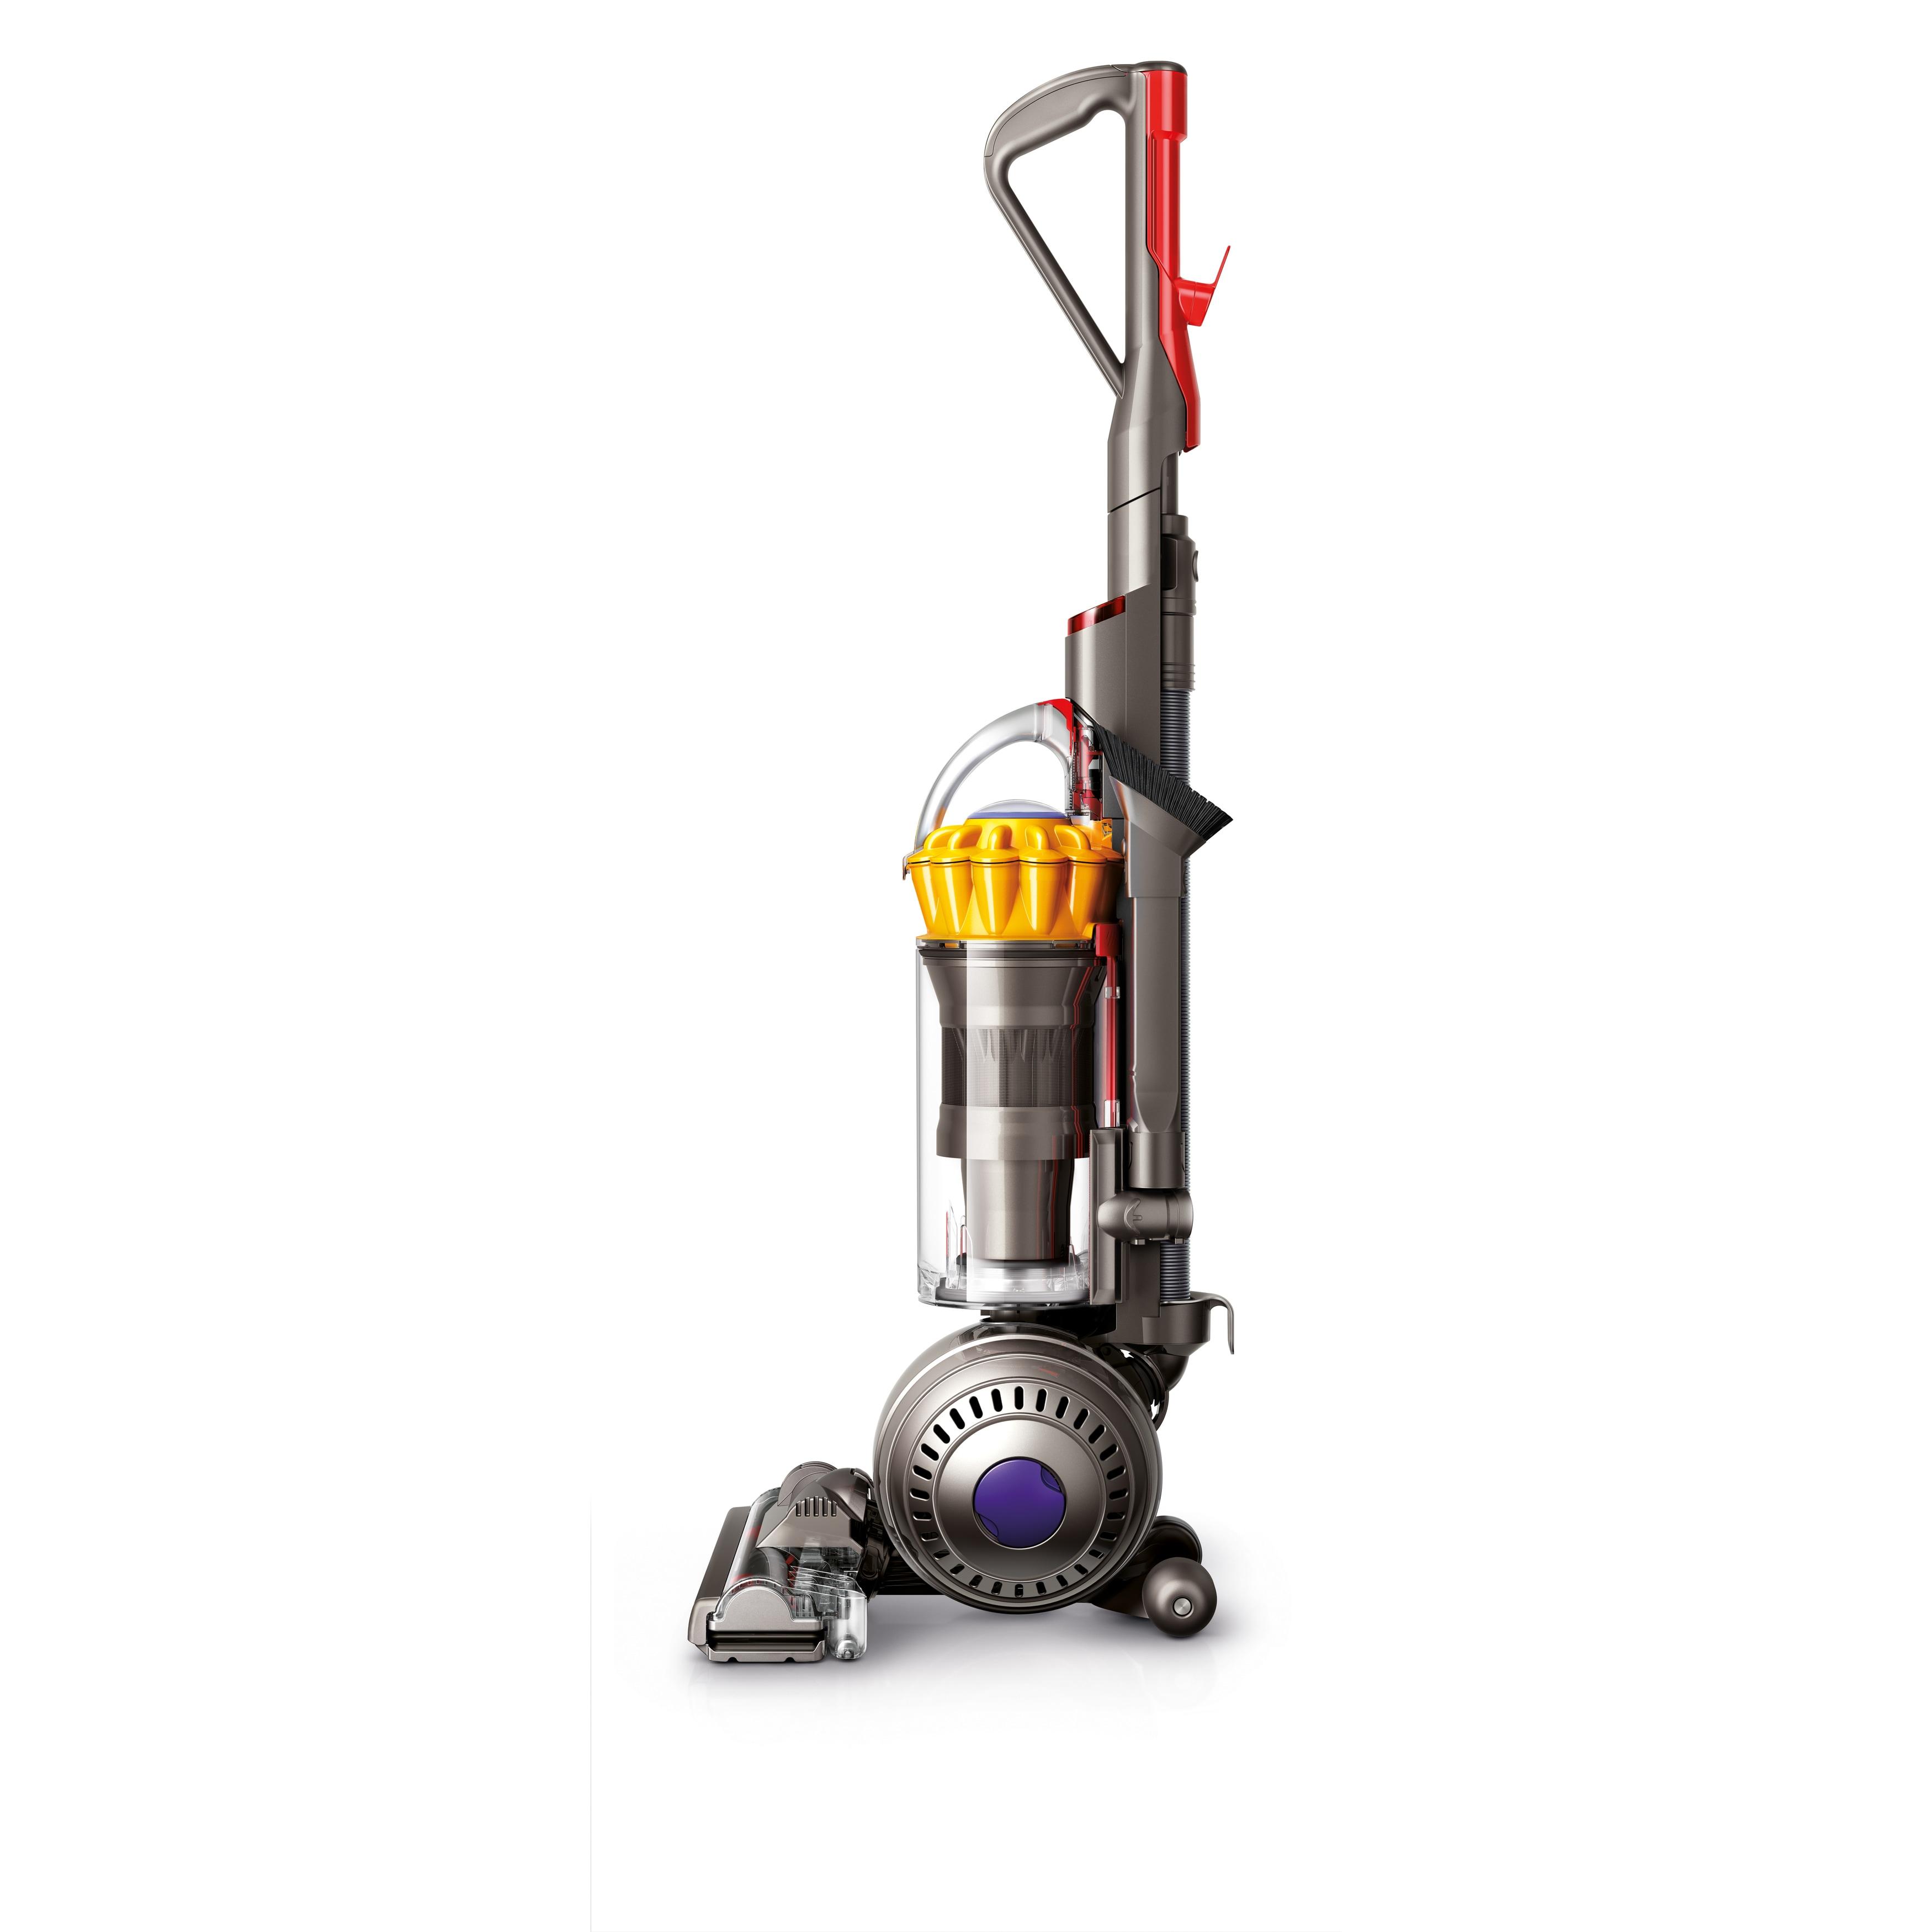 Dyson DC40 Animal Origin Upright Vacuum (Refurbished) (202874-02)